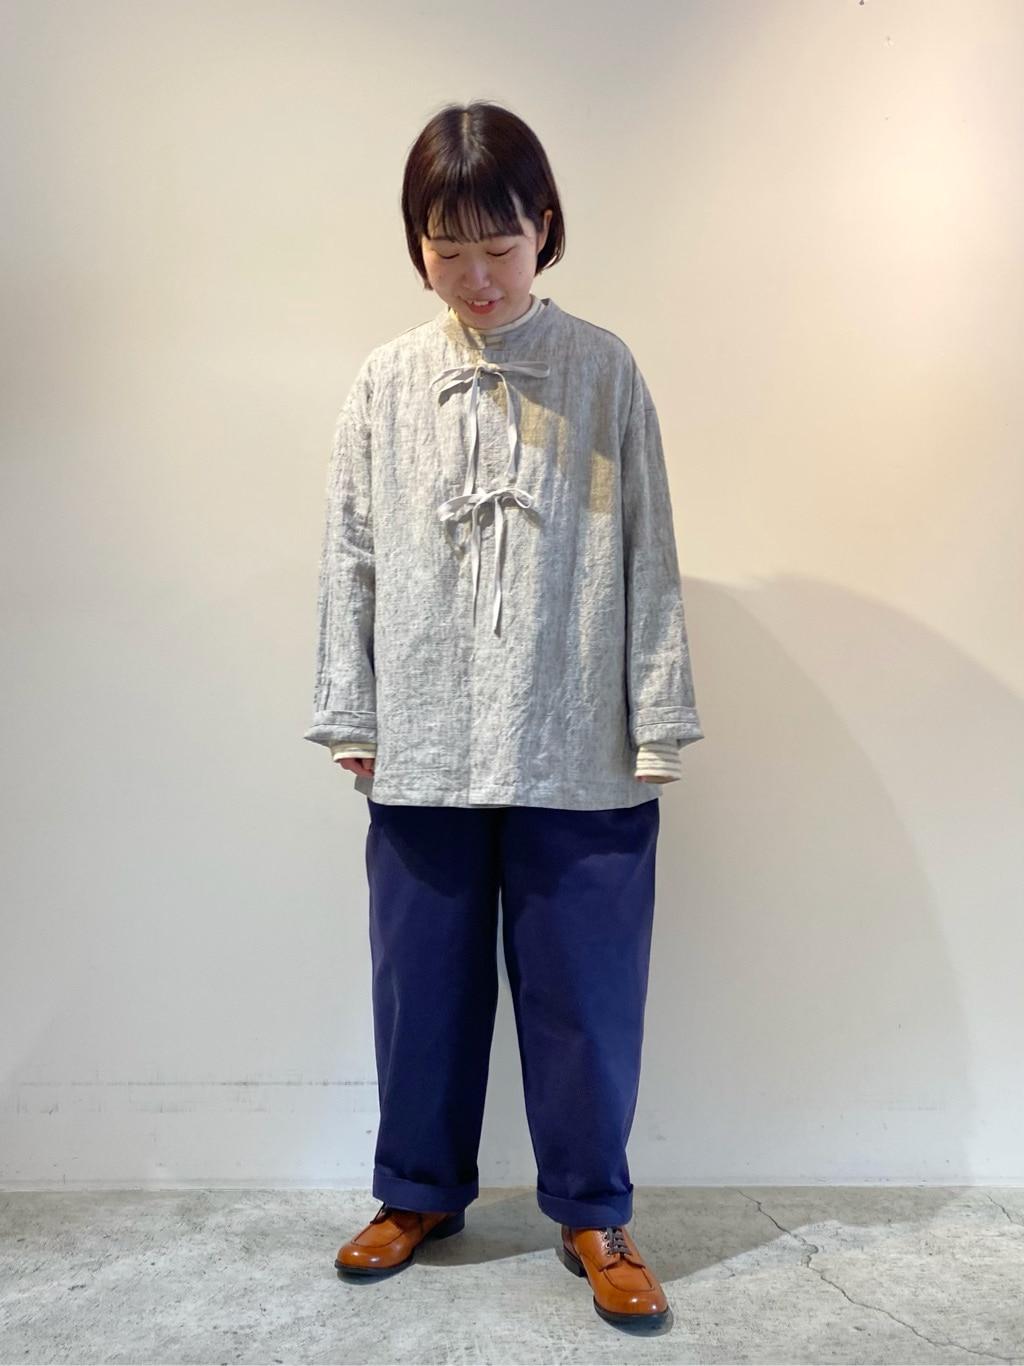 chambre de charme 京都路面 身長:150cm 2021.03.26